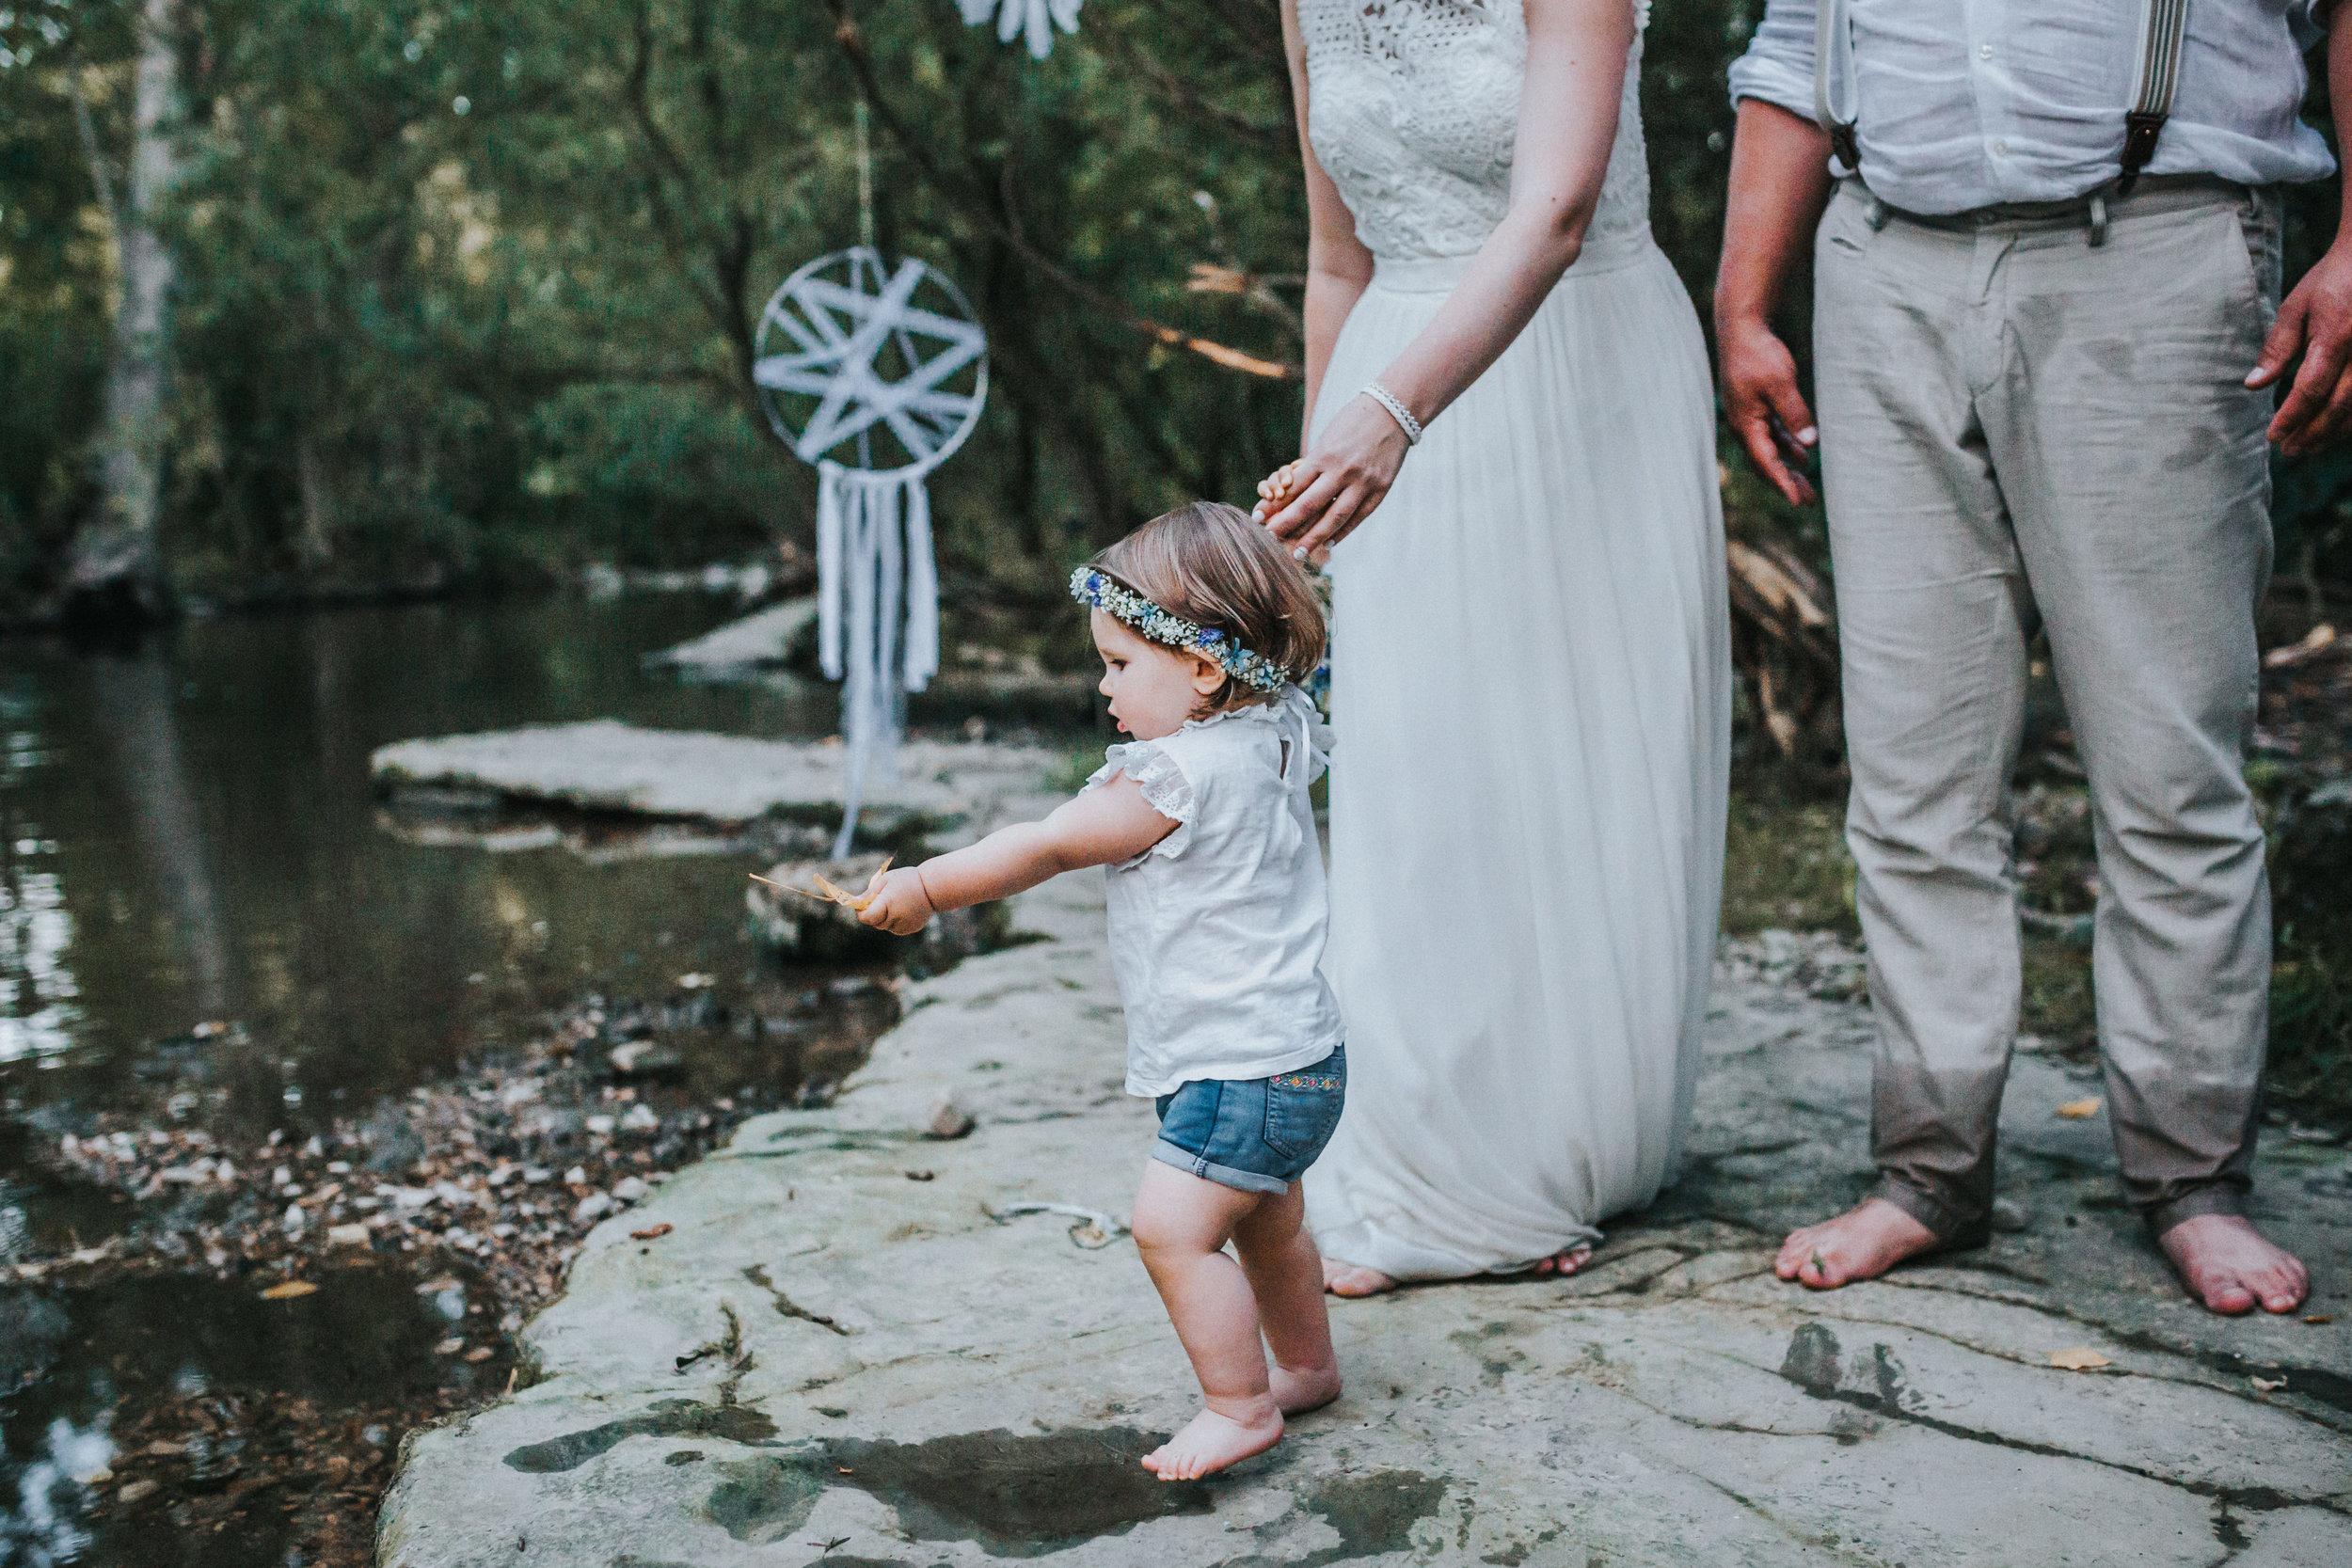 yessica-baur-fotografie-after-wedding-tübingen-121-1266.JPG